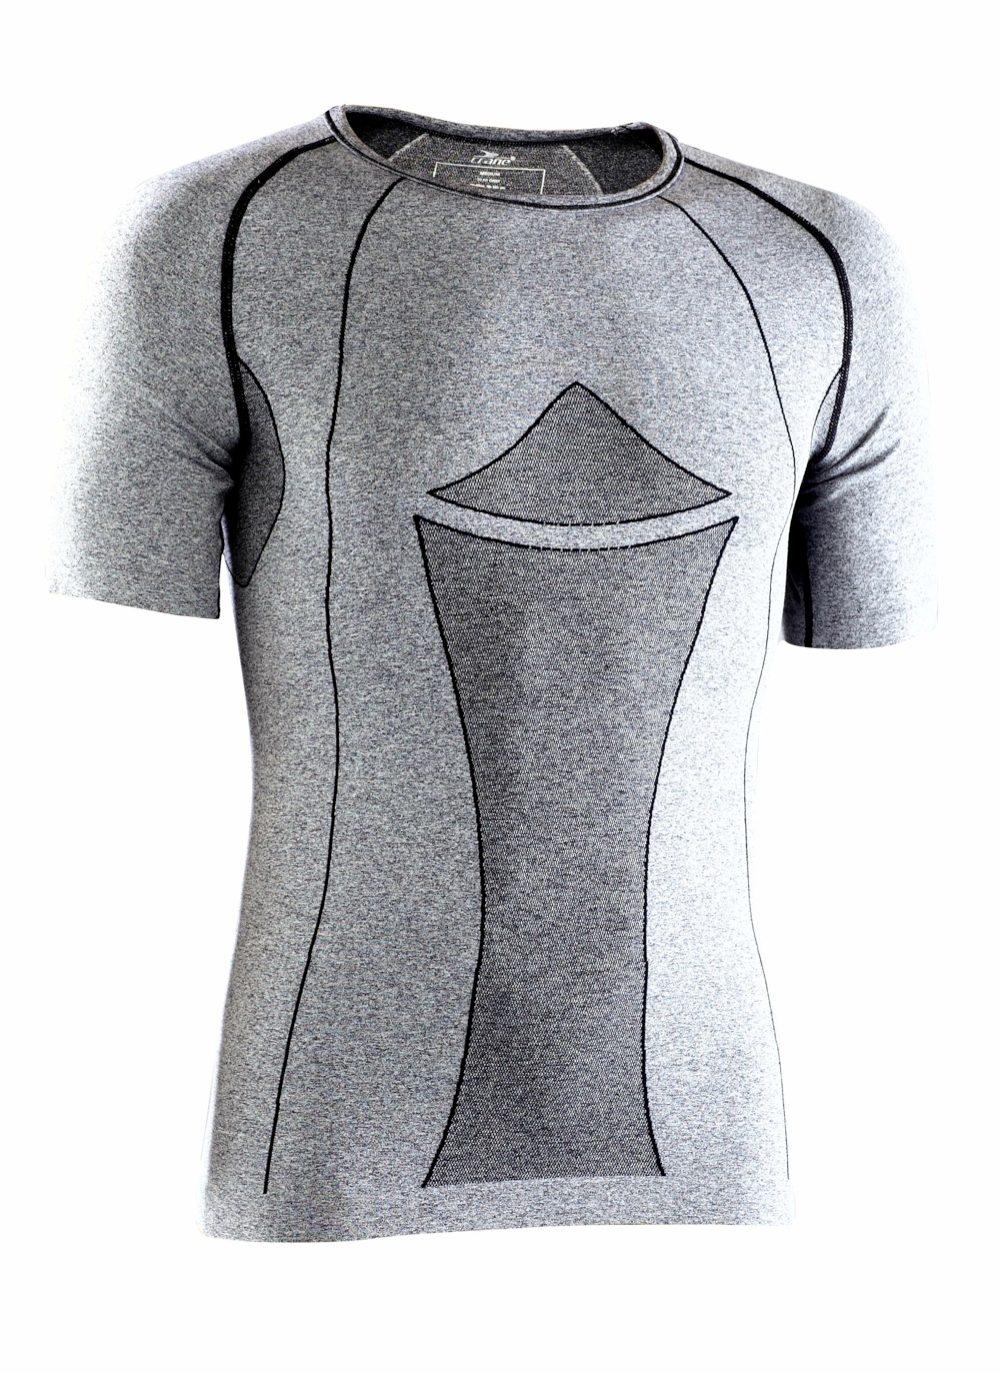 Alsi seamless undershirt, £5.99